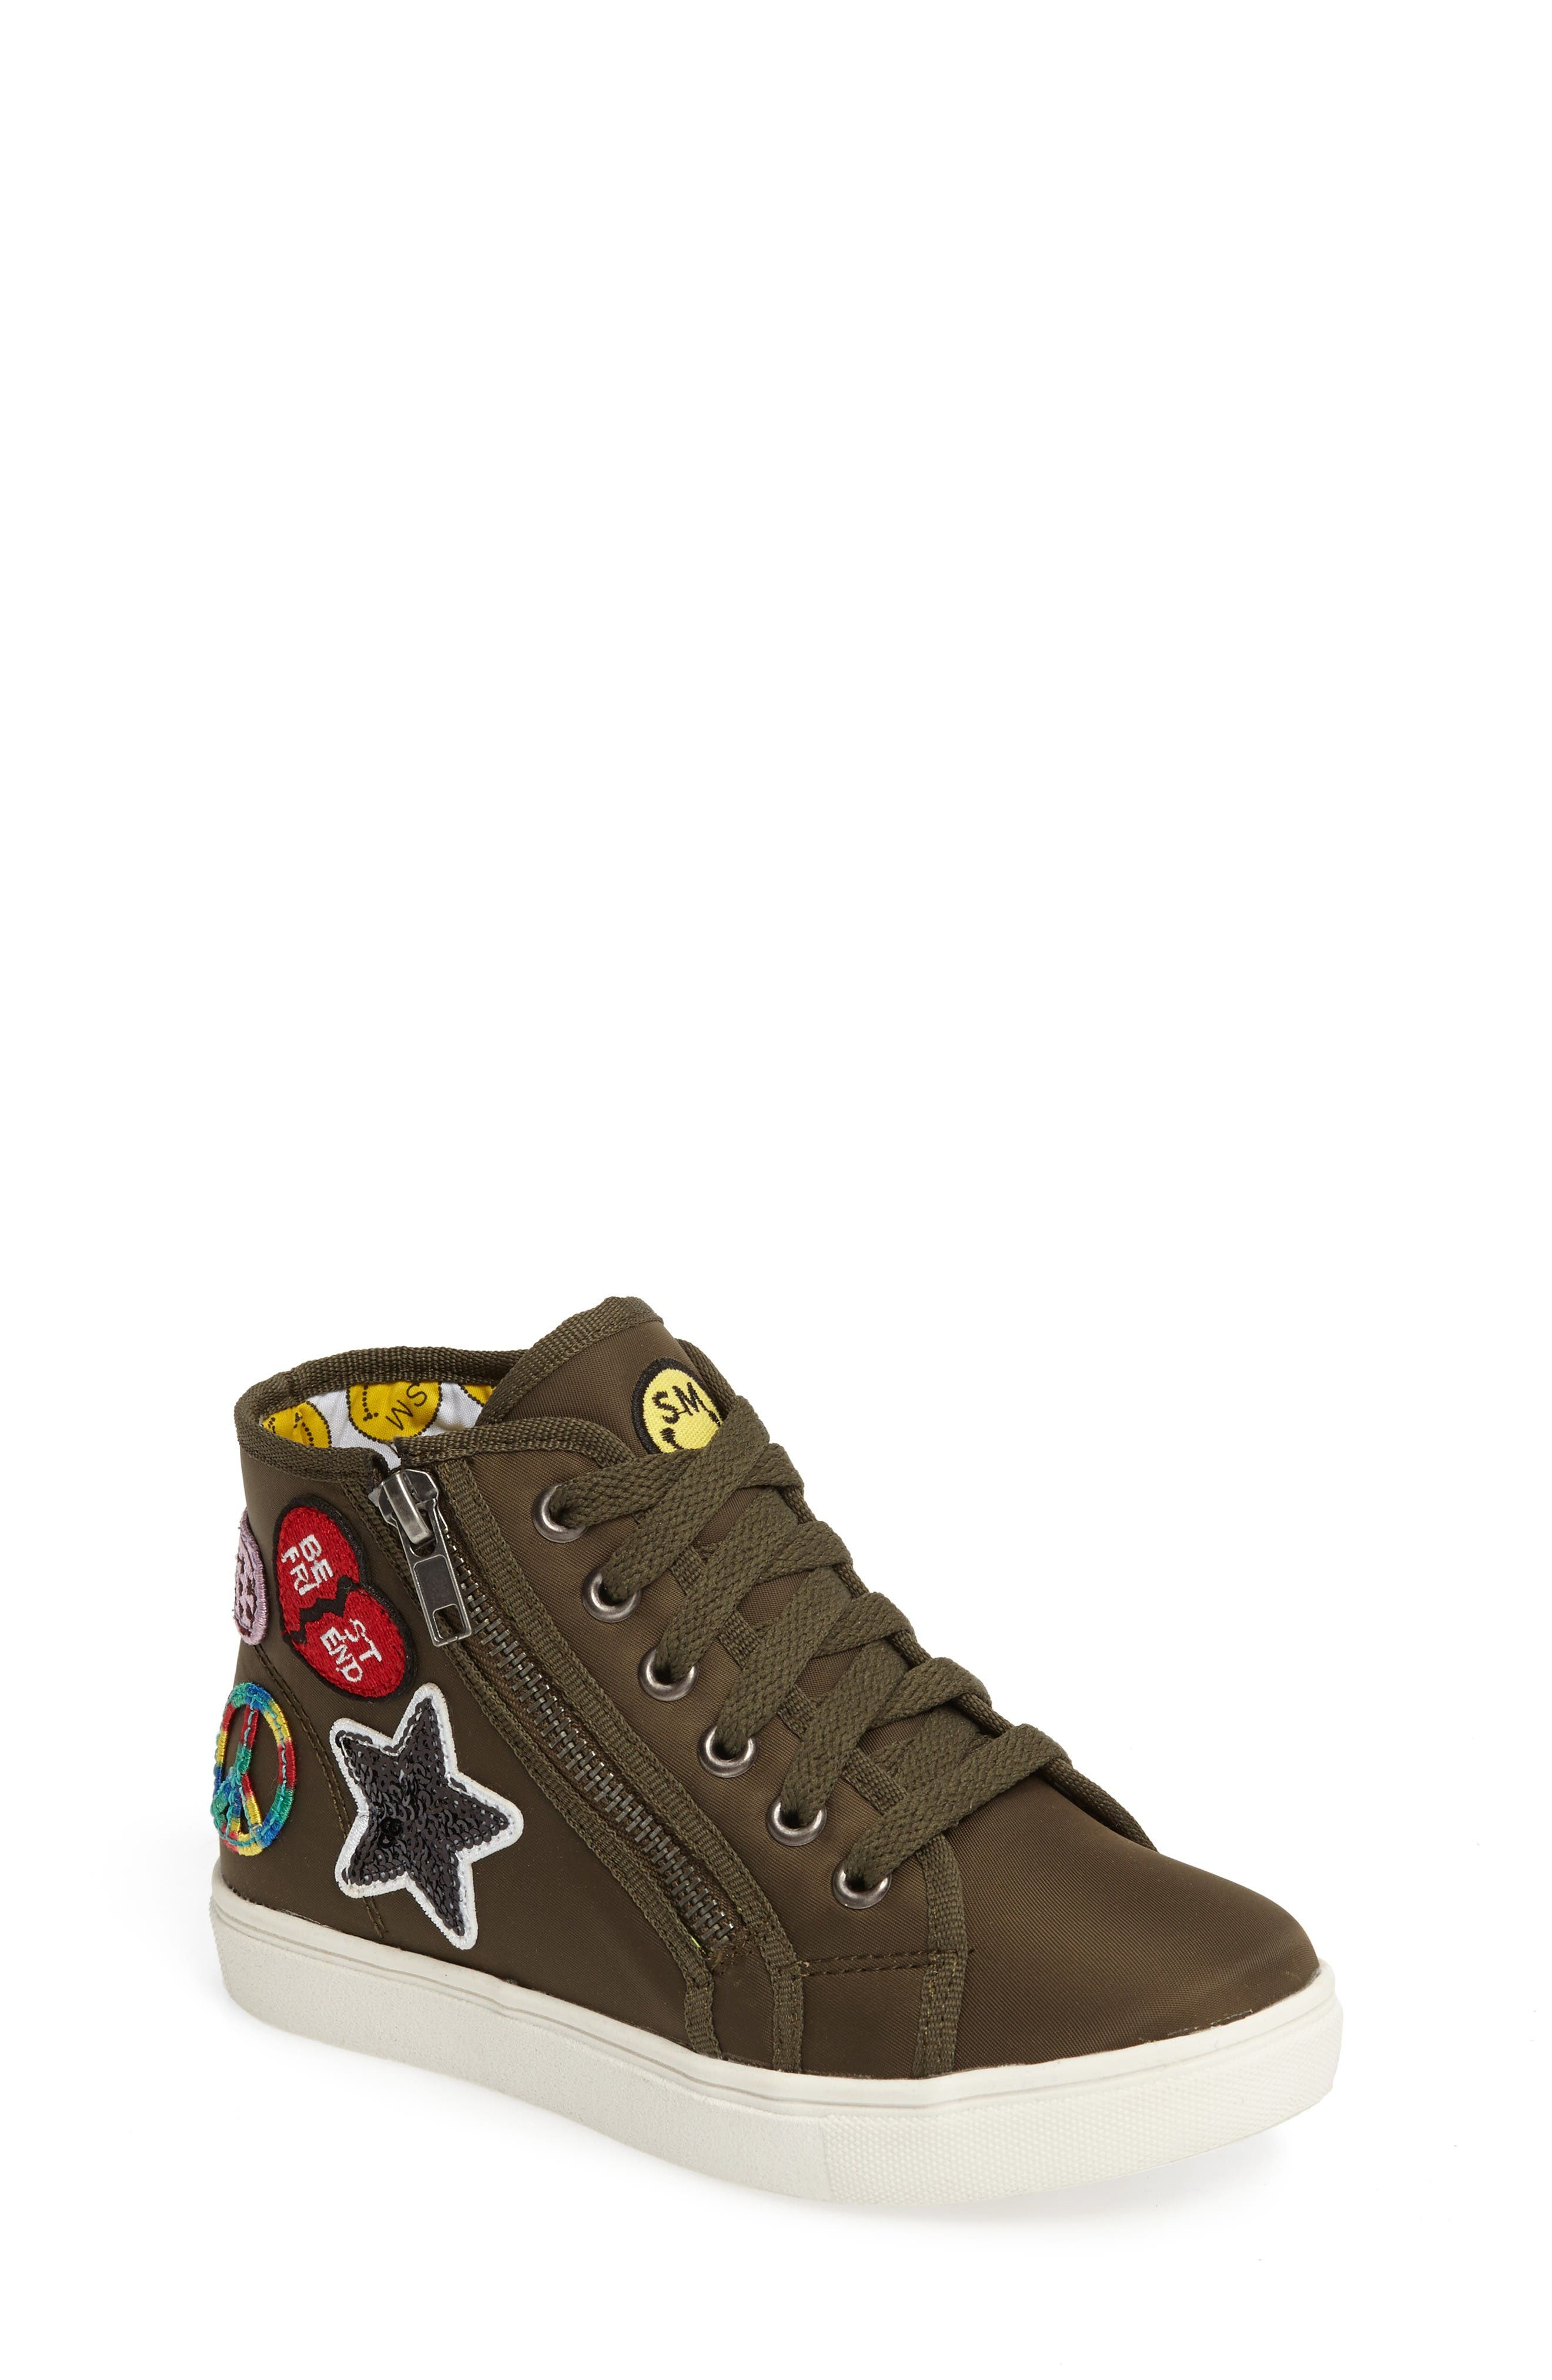 Alternate Image 1 Selected - Steve Madden Code High Top Zip Sneaker (Toddler, Little Kid & Big Kid)